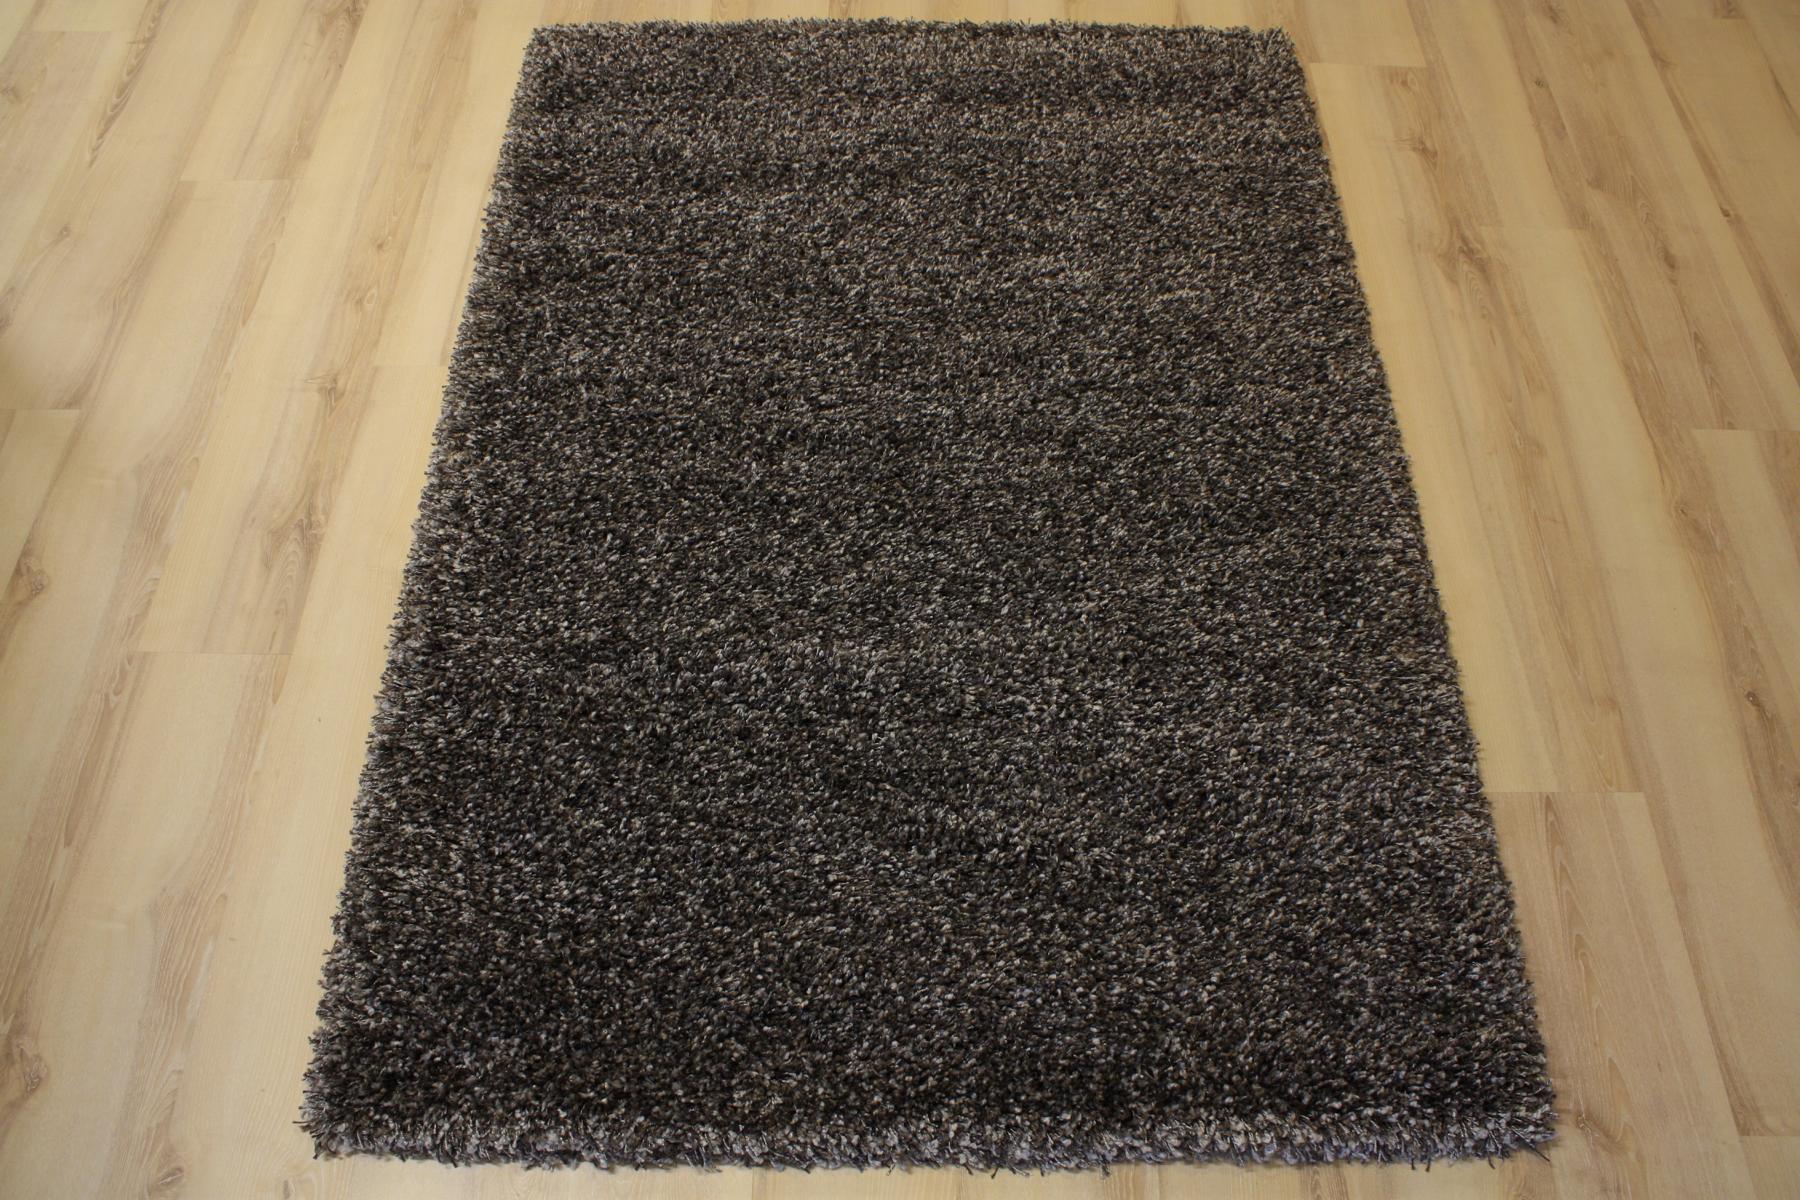 teppich langflor 39001 twilight 7799 metallic bronze 200x250cm ebay. Black Bedroom Furniture Sets. Home Design Ideas